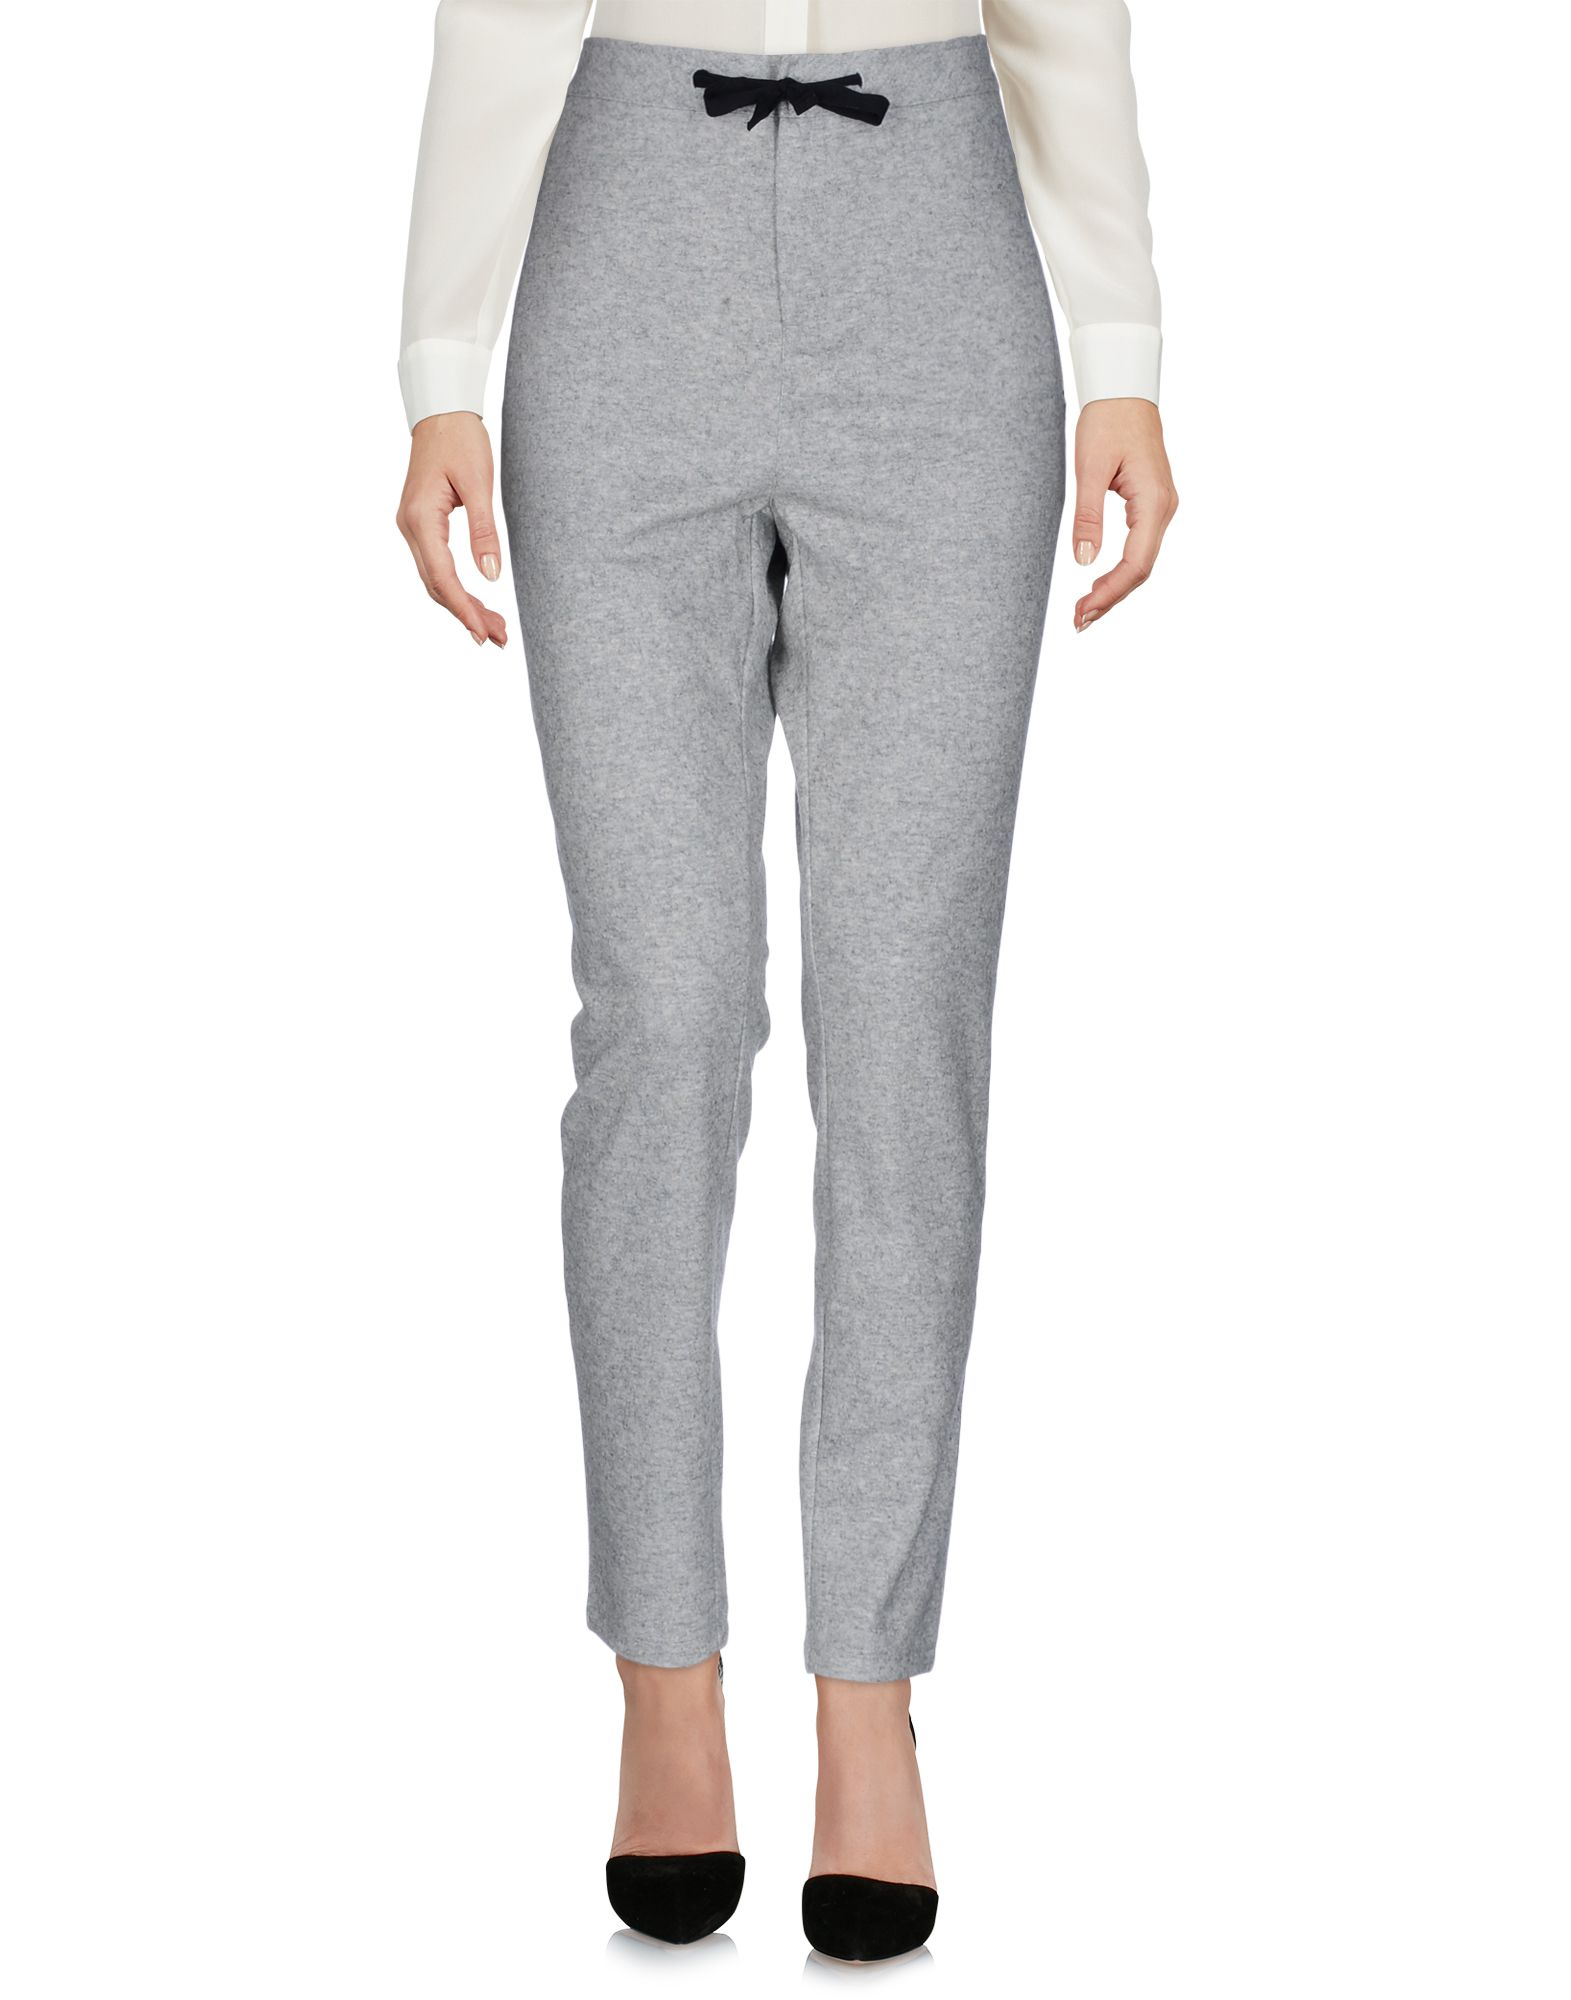 Pantalone Pantalone Pantalone Maison Scotch donna - 13079833CR d1a